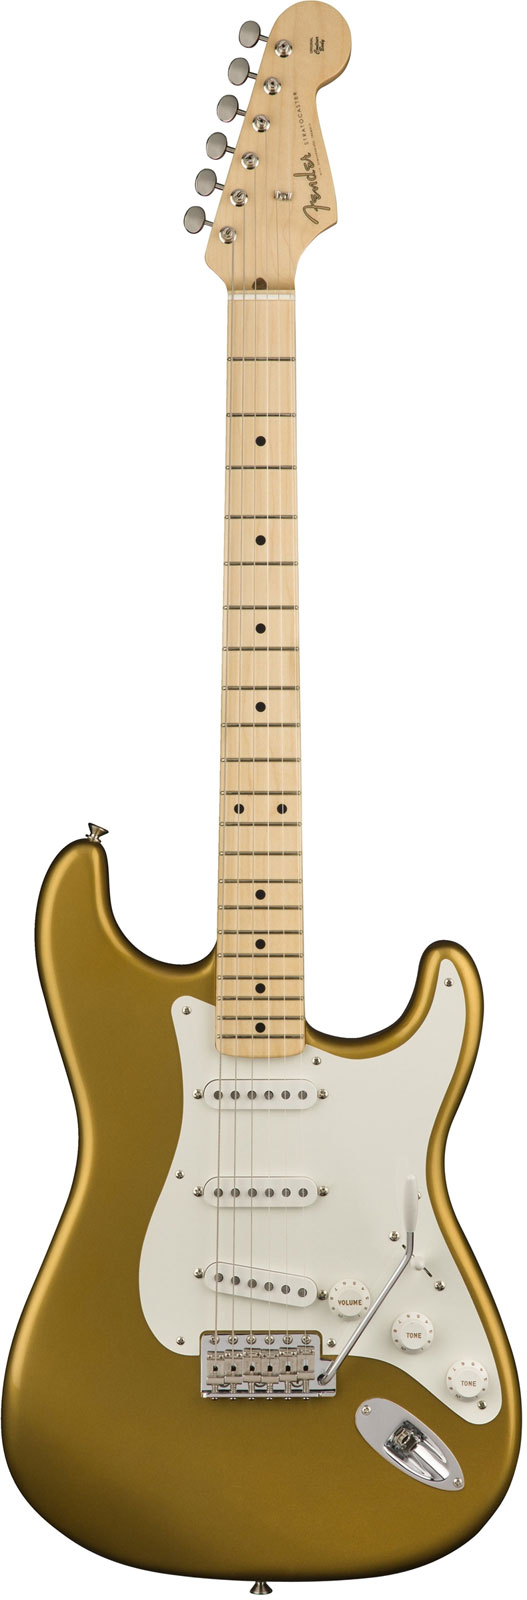 Fender American Original 50s Stratocaster Mn Azg